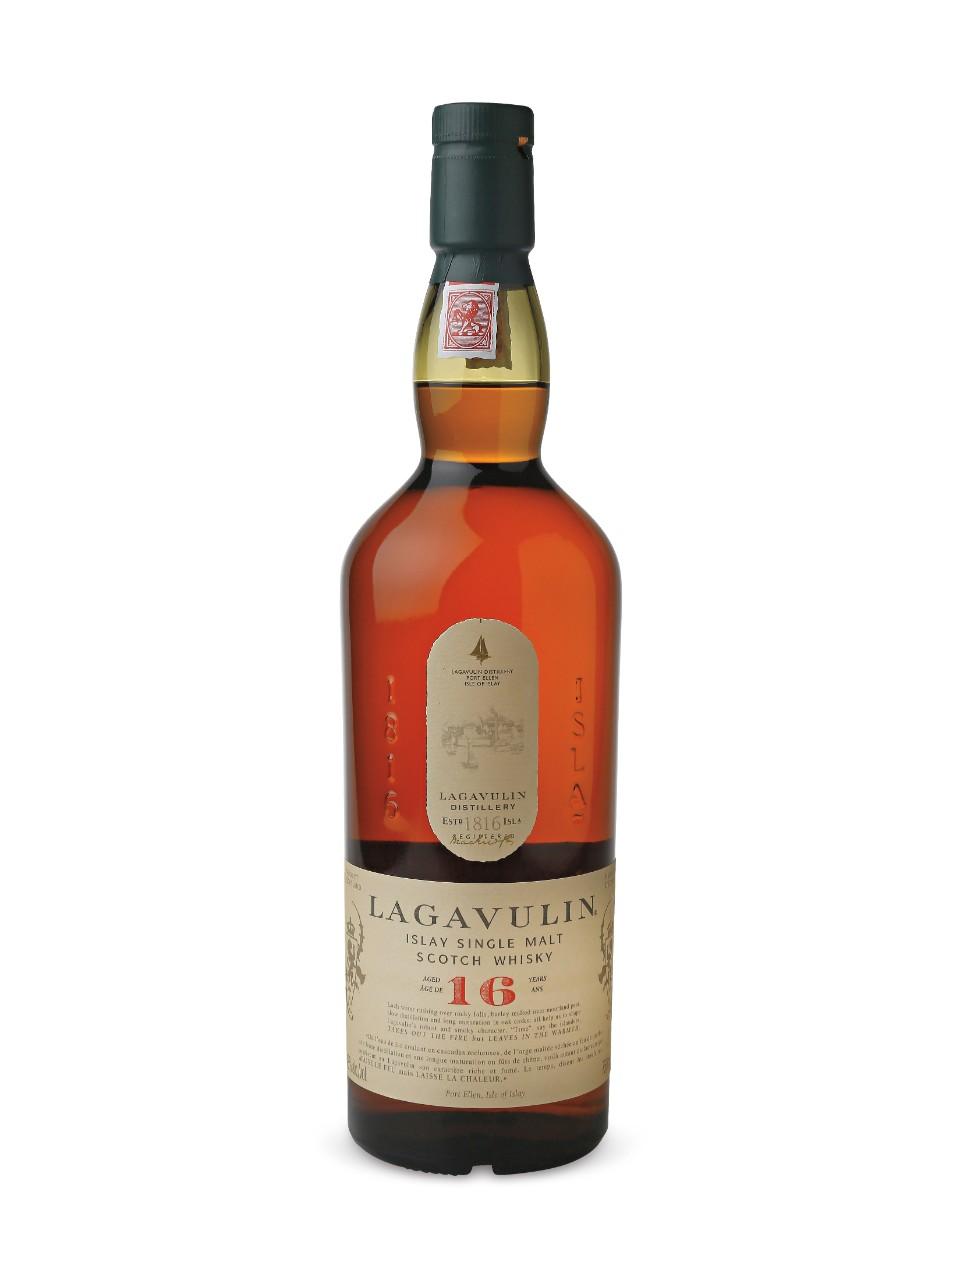 Lagavulin 16 Year Old Islay Single Malt Scotch Whisky Lcbo